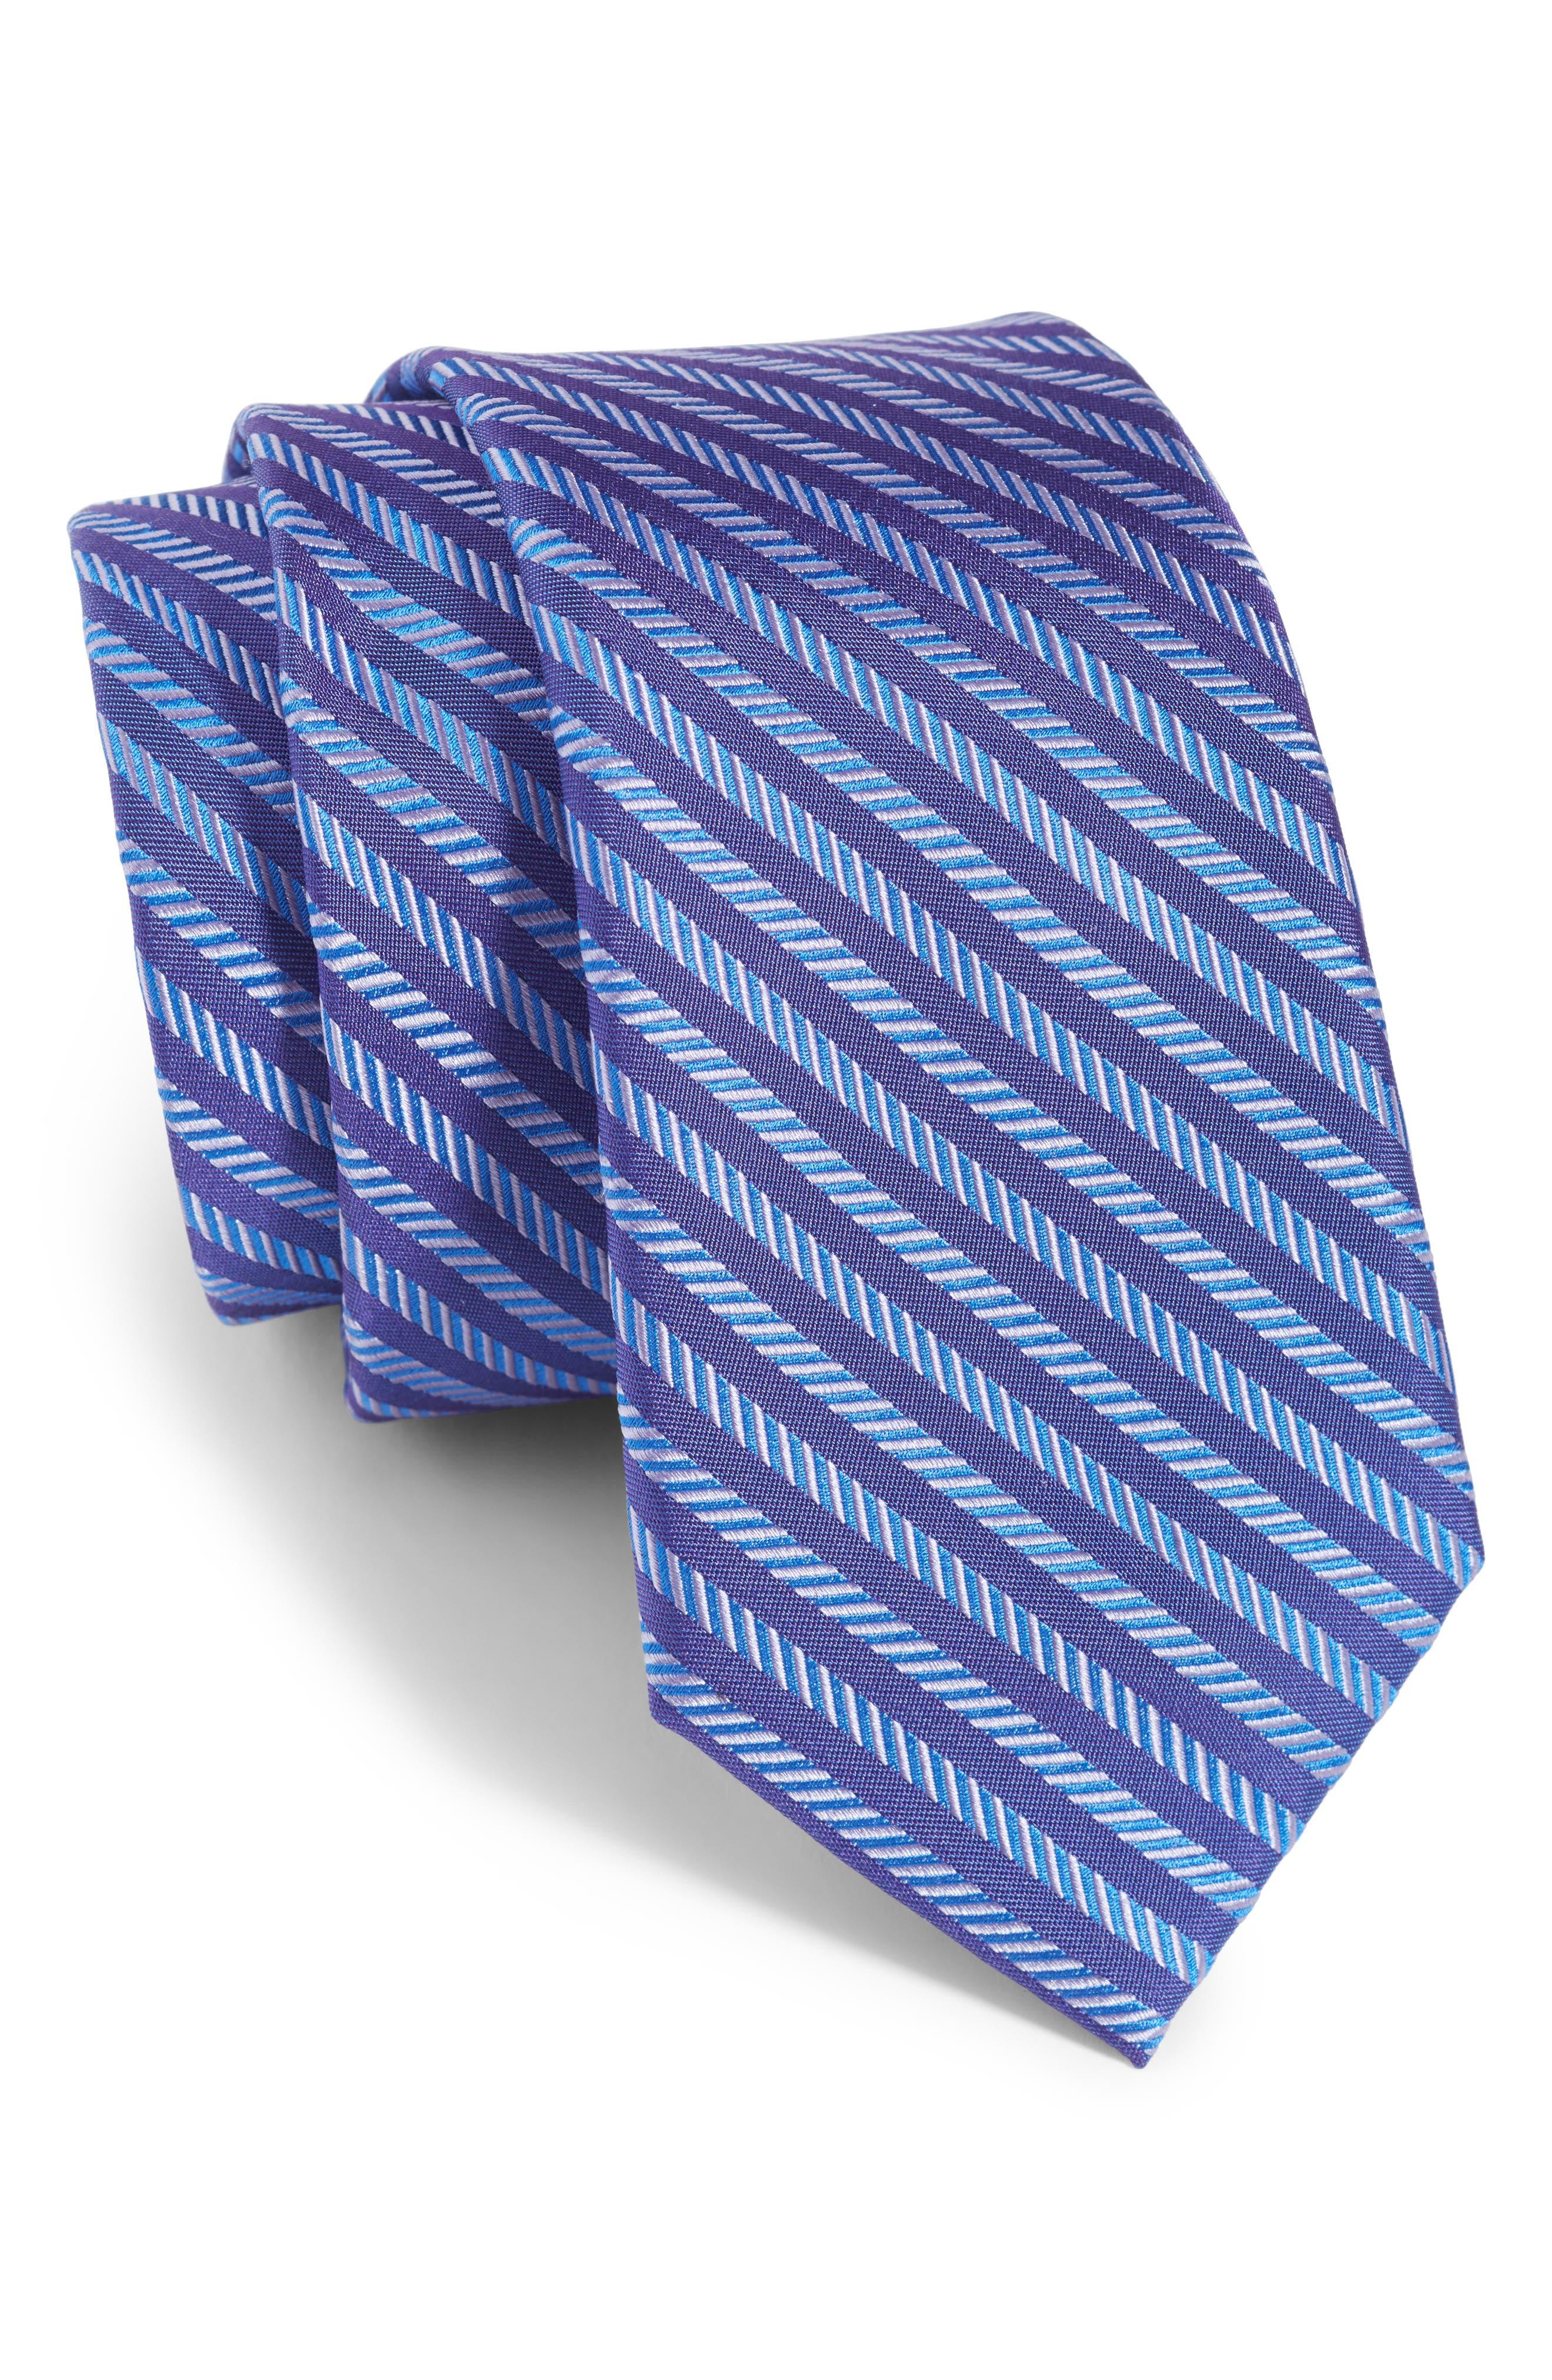 Main Image - Michael Kors Herringbone Stripe Silk Tie (Boys)